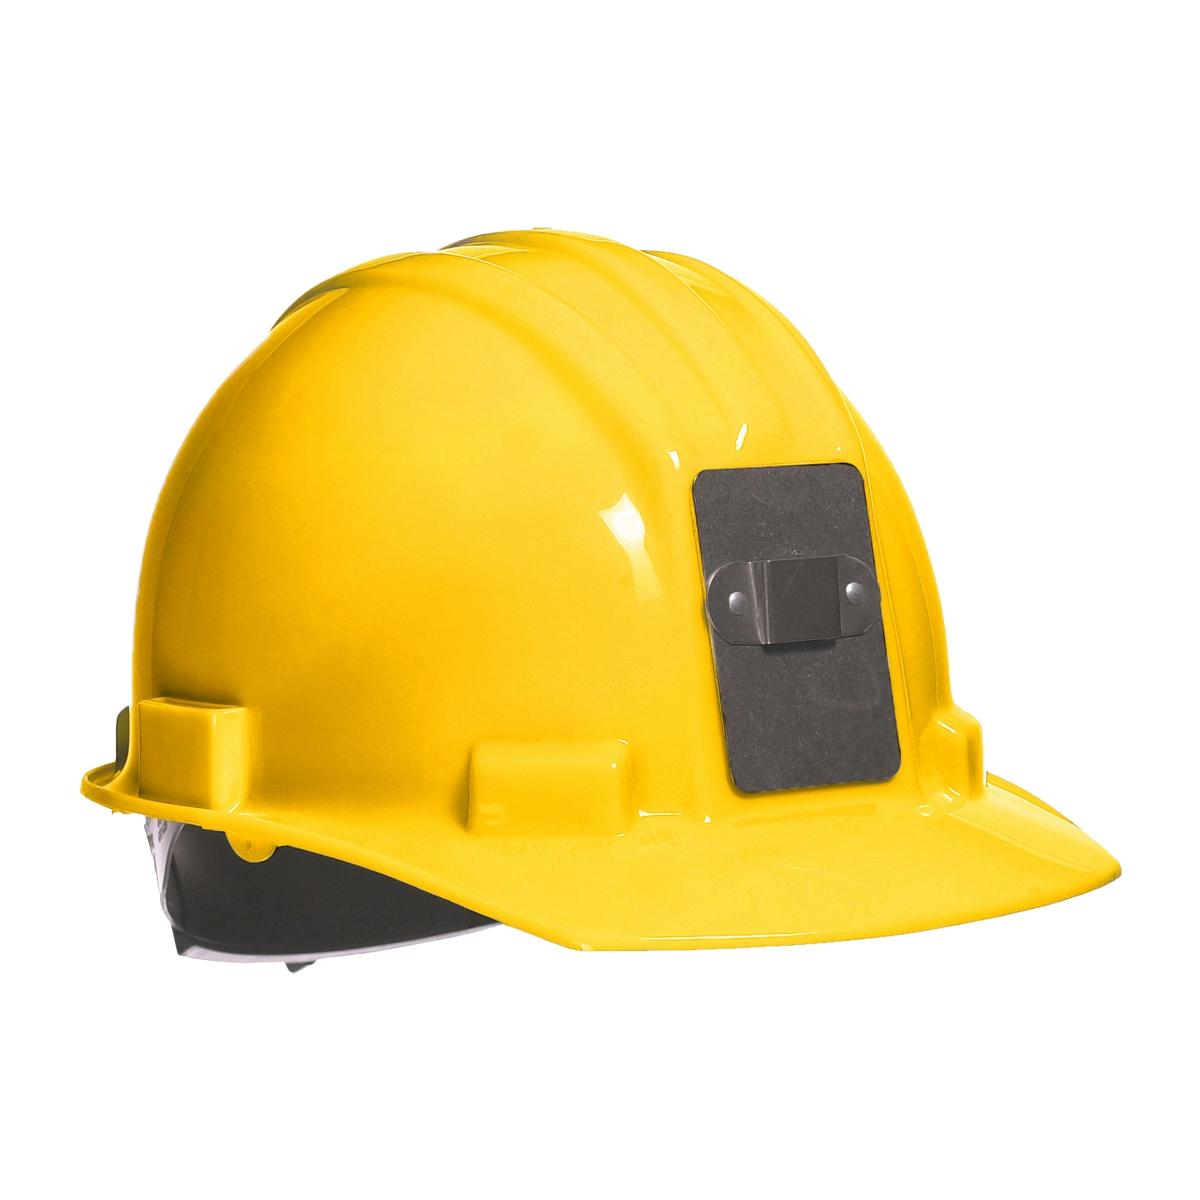 Bullard S51ylrm Mining Hard Hat Ratchet Suspension